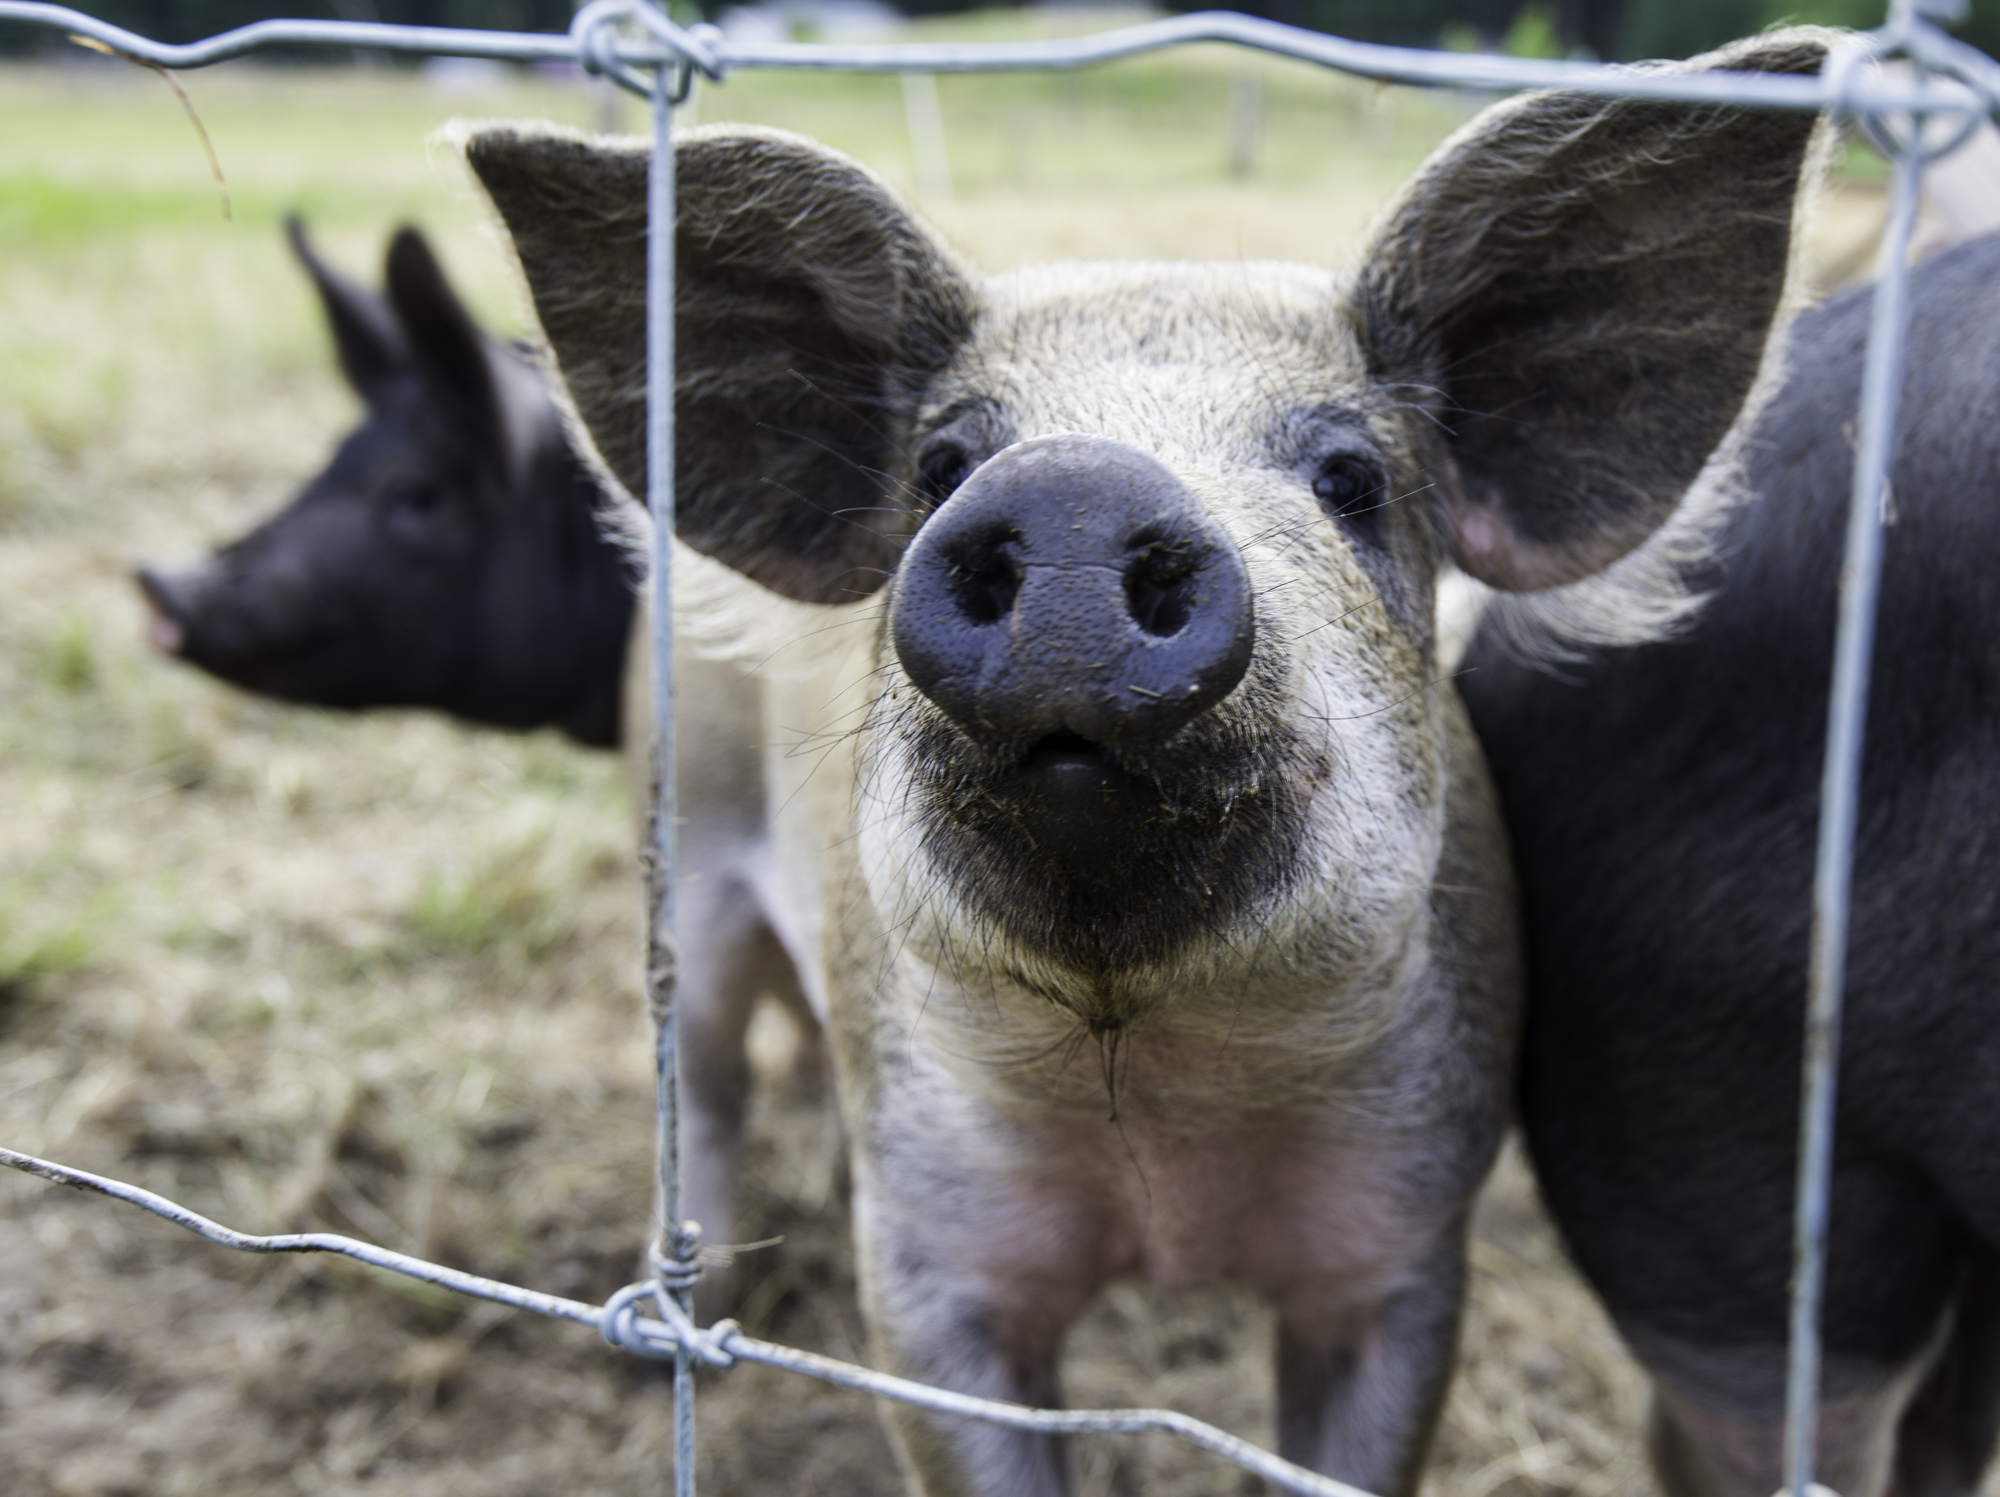 lopez island farming farmers pigs organic local